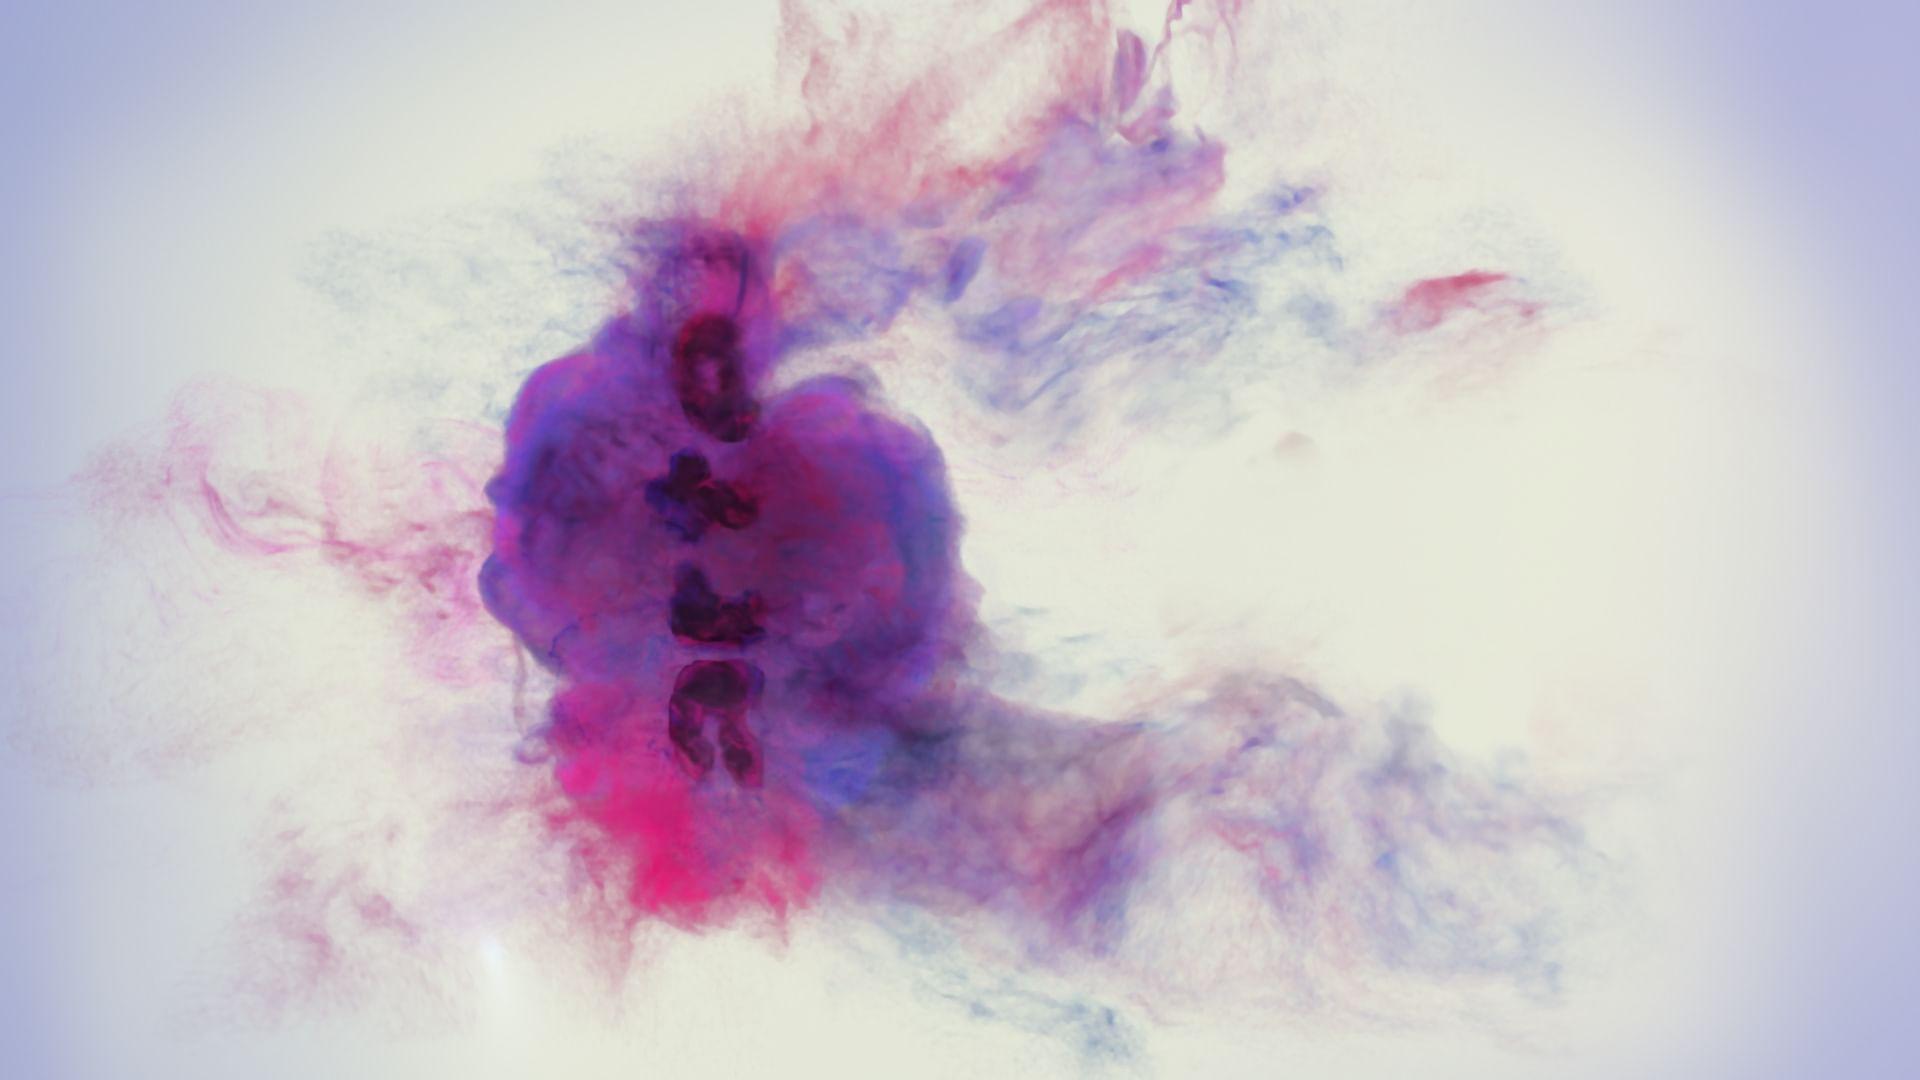 Street Photography - Graffiti Art. Henry Chalfant